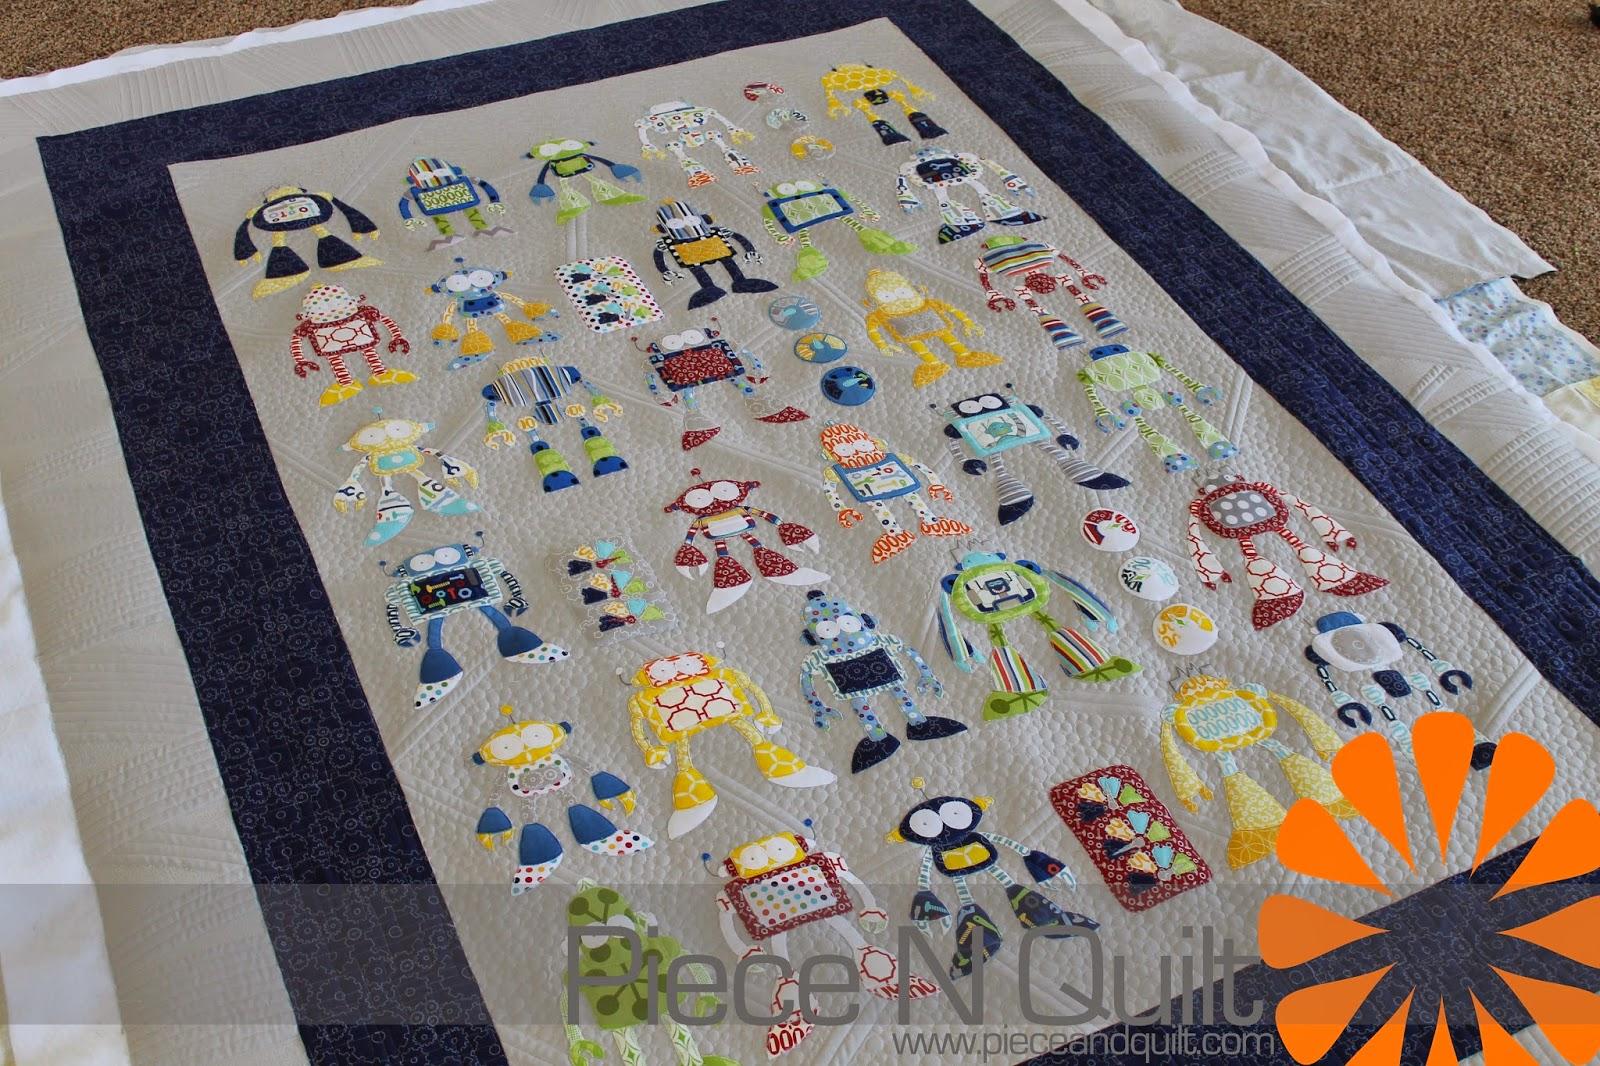 Piece N Quilt: Robot Riot : piece n quilt - Adamdwight.com